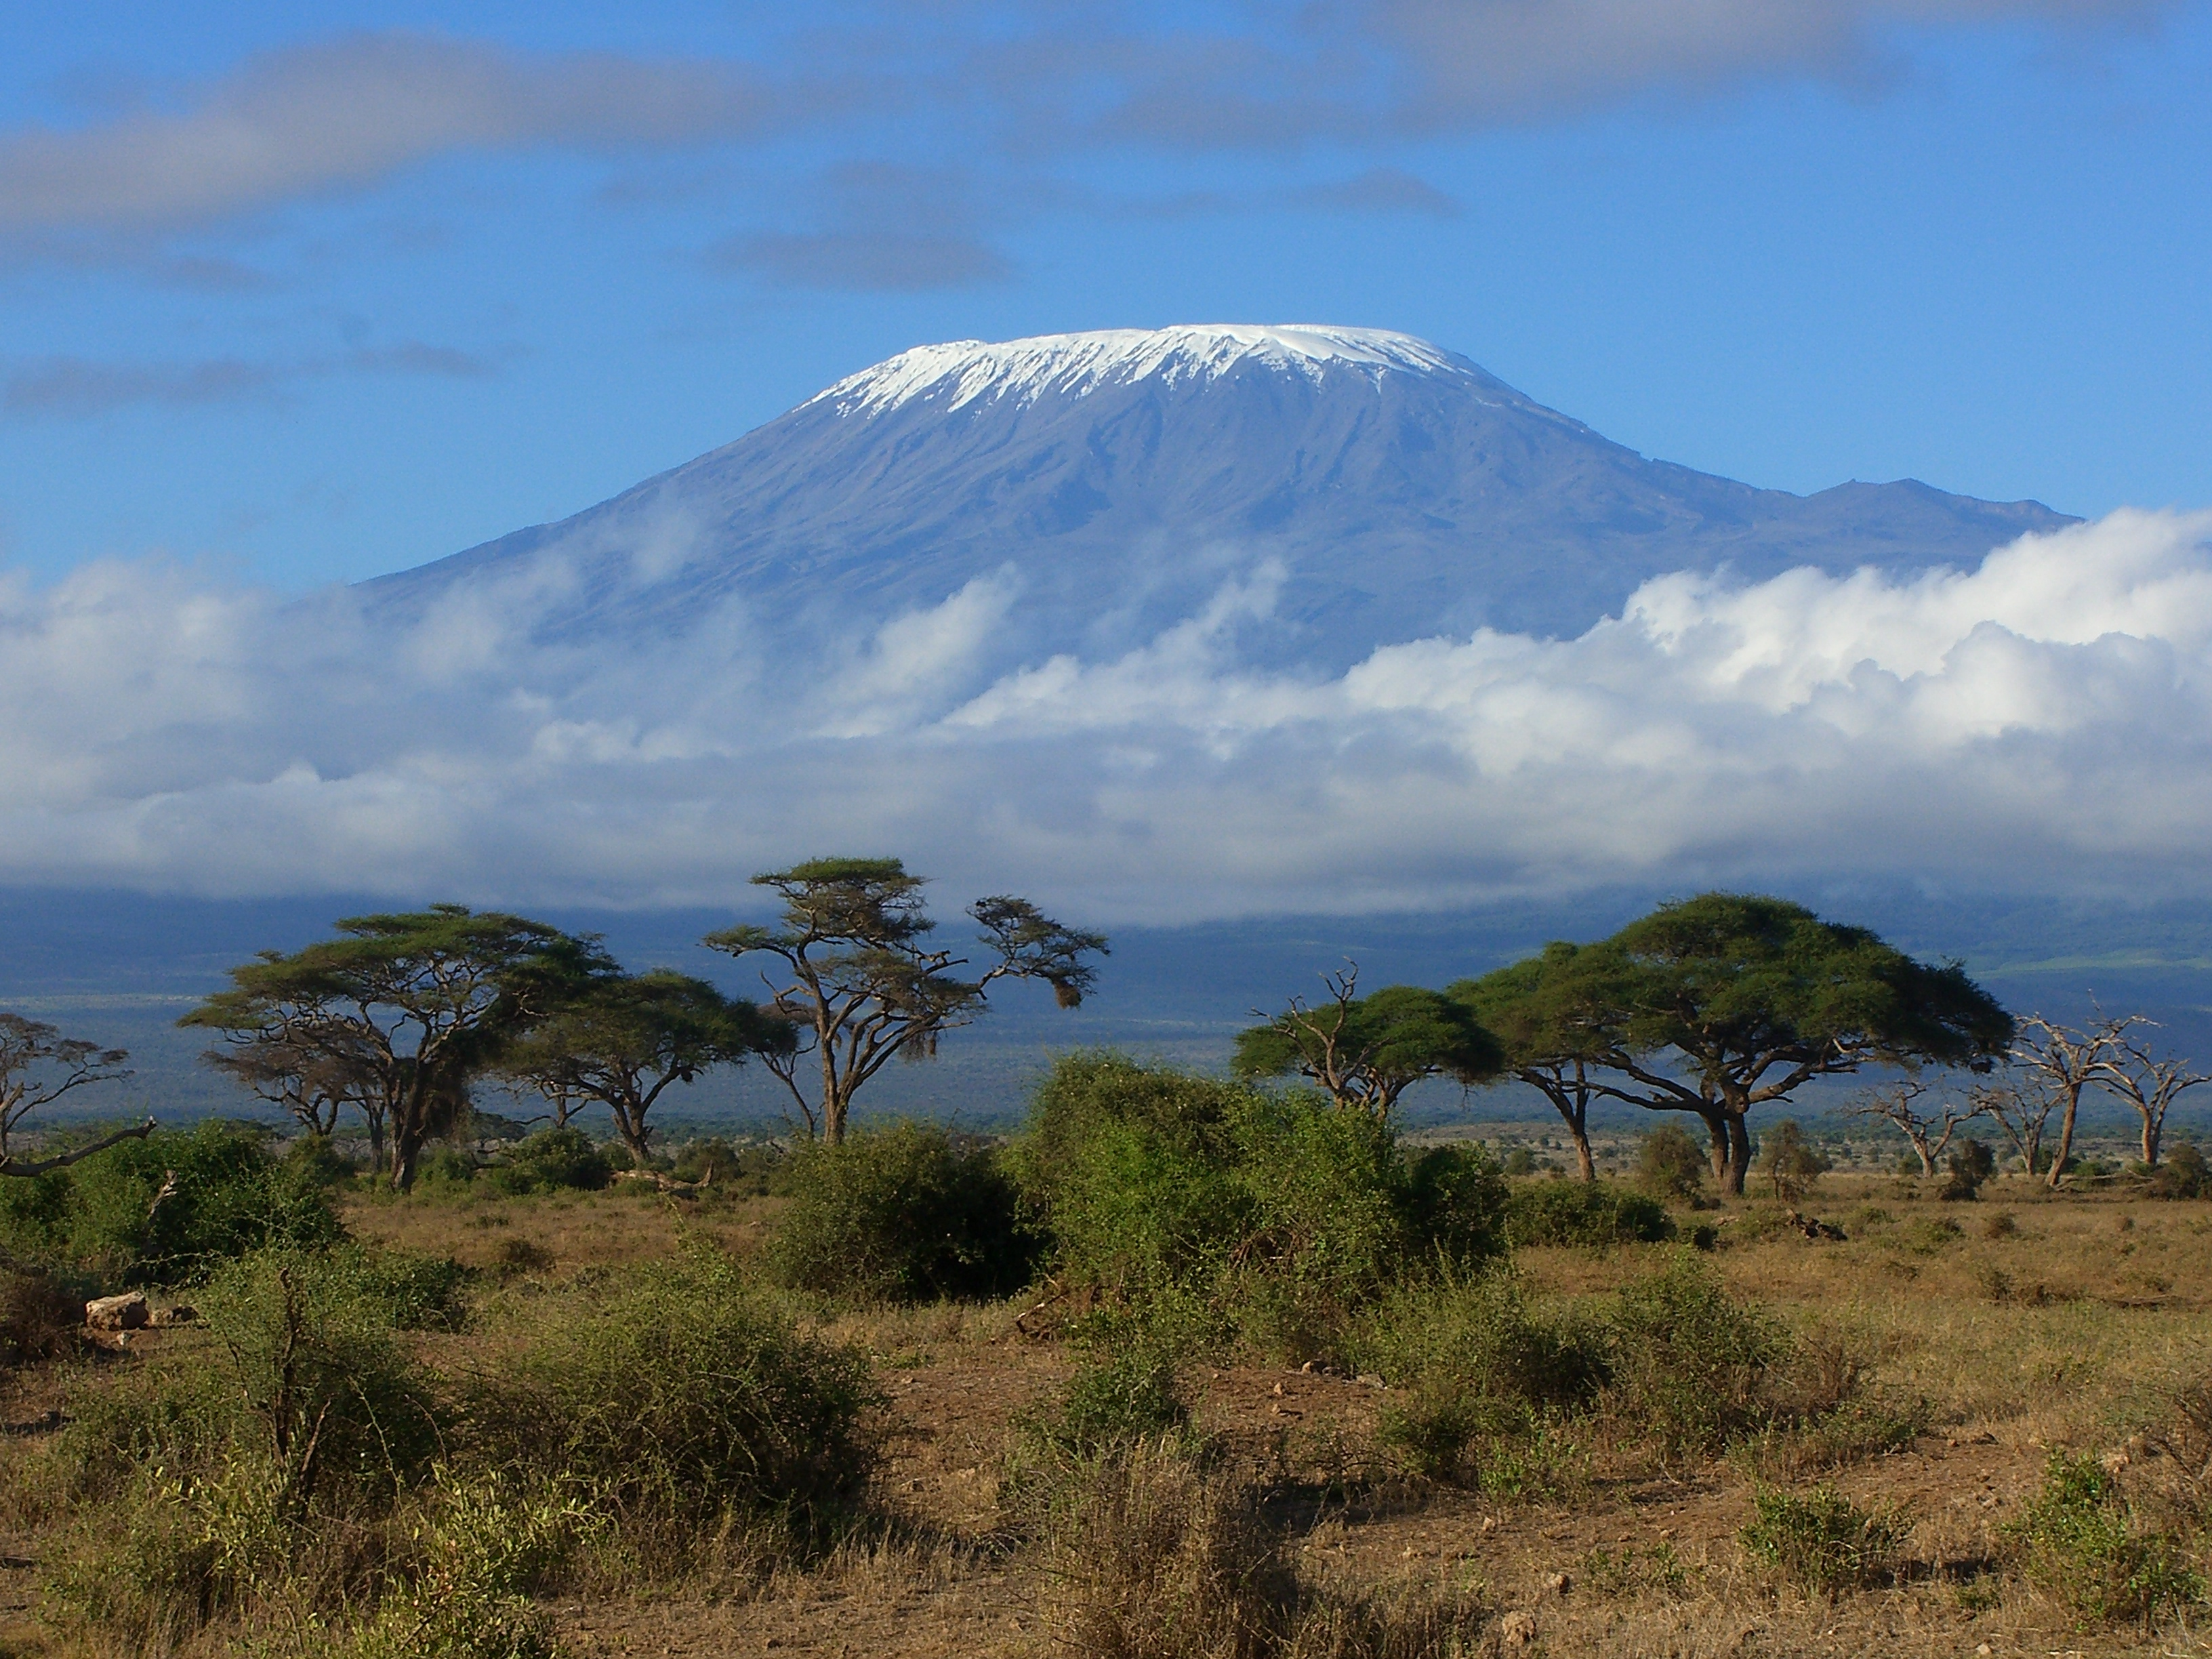 Mt Kilimanjaro From Serengeti - 3264x2448 - Download HD Wallpaper -  WallpaperTip